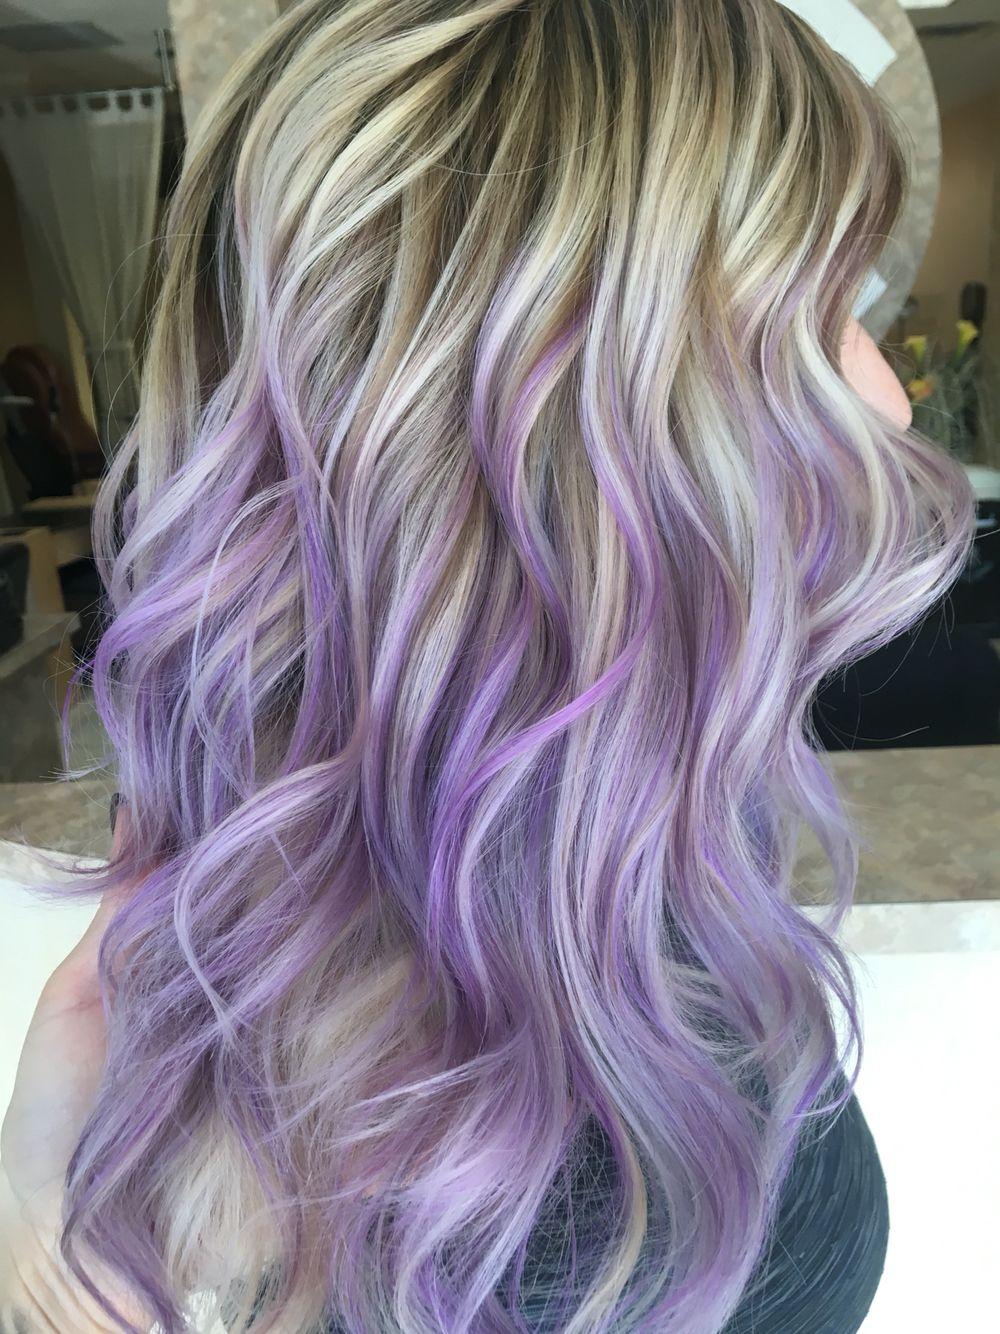 Blonde Hair Titanium Ash Blonde Pastel Light Purple Lilac Hand